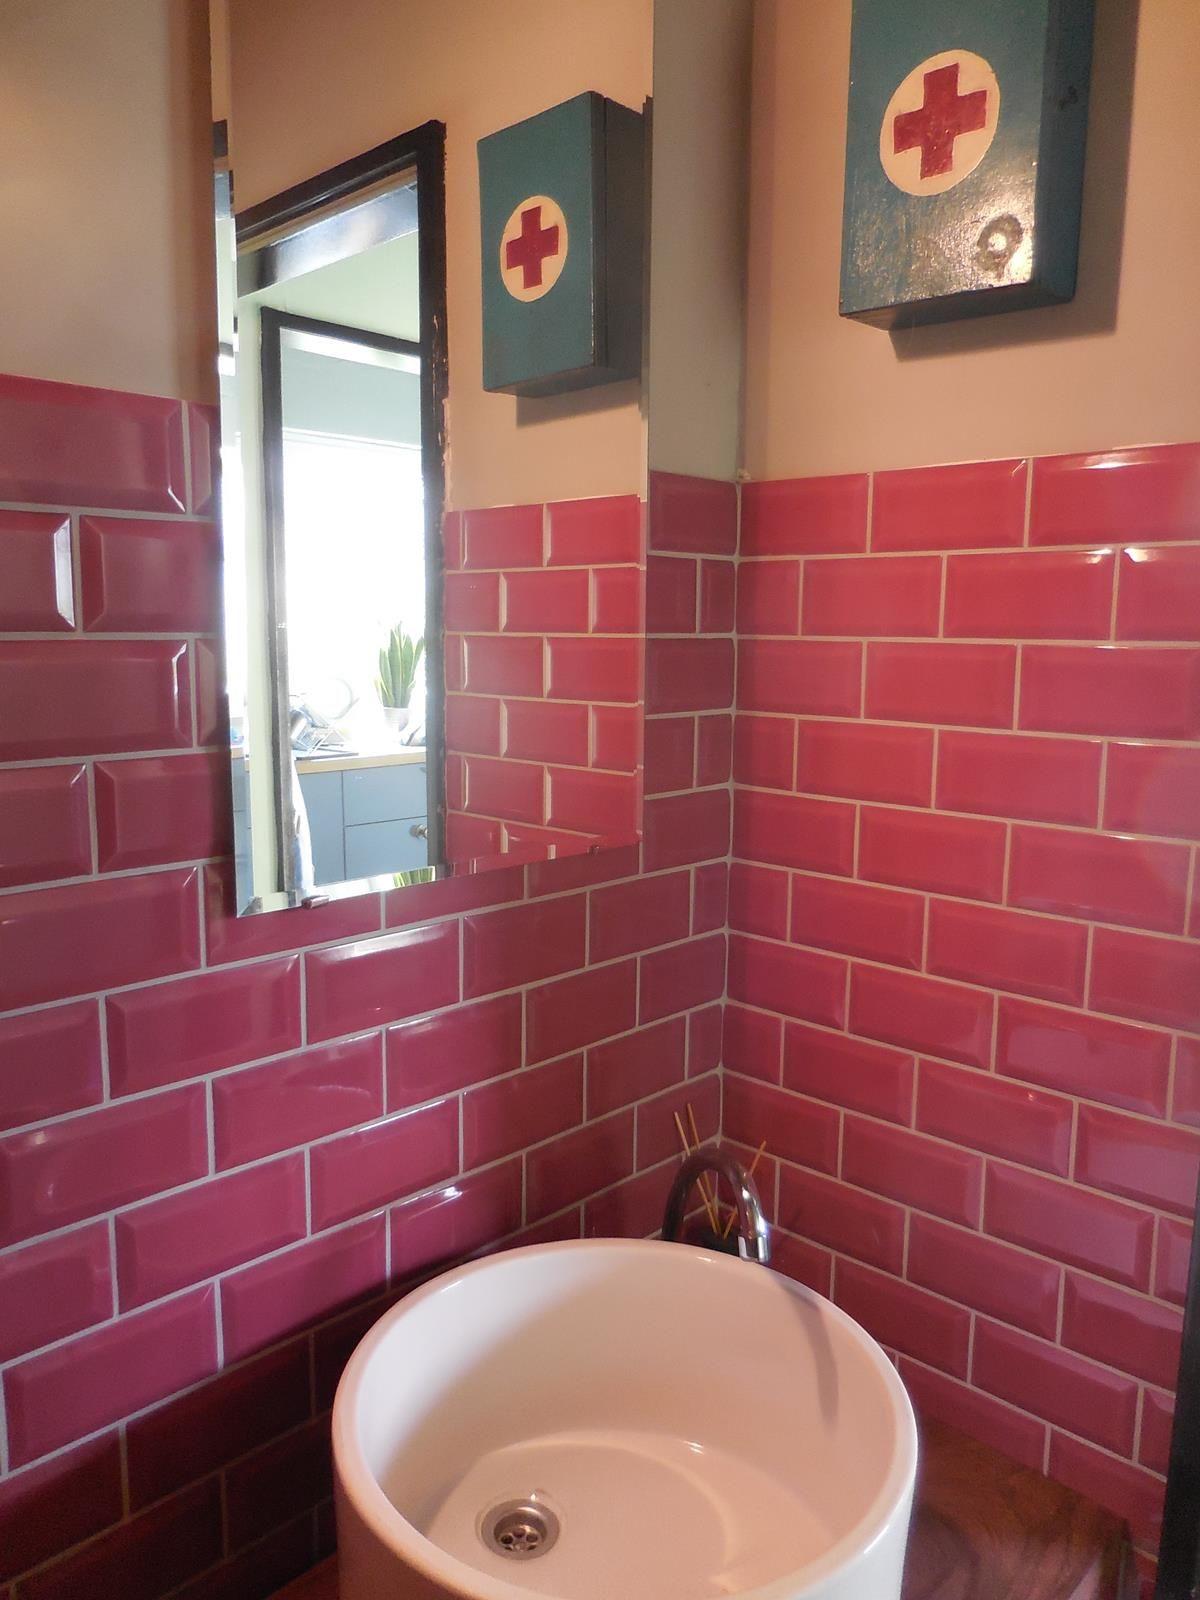 southern tiles serie cv metro fuxia 7 5x15 cm privat object